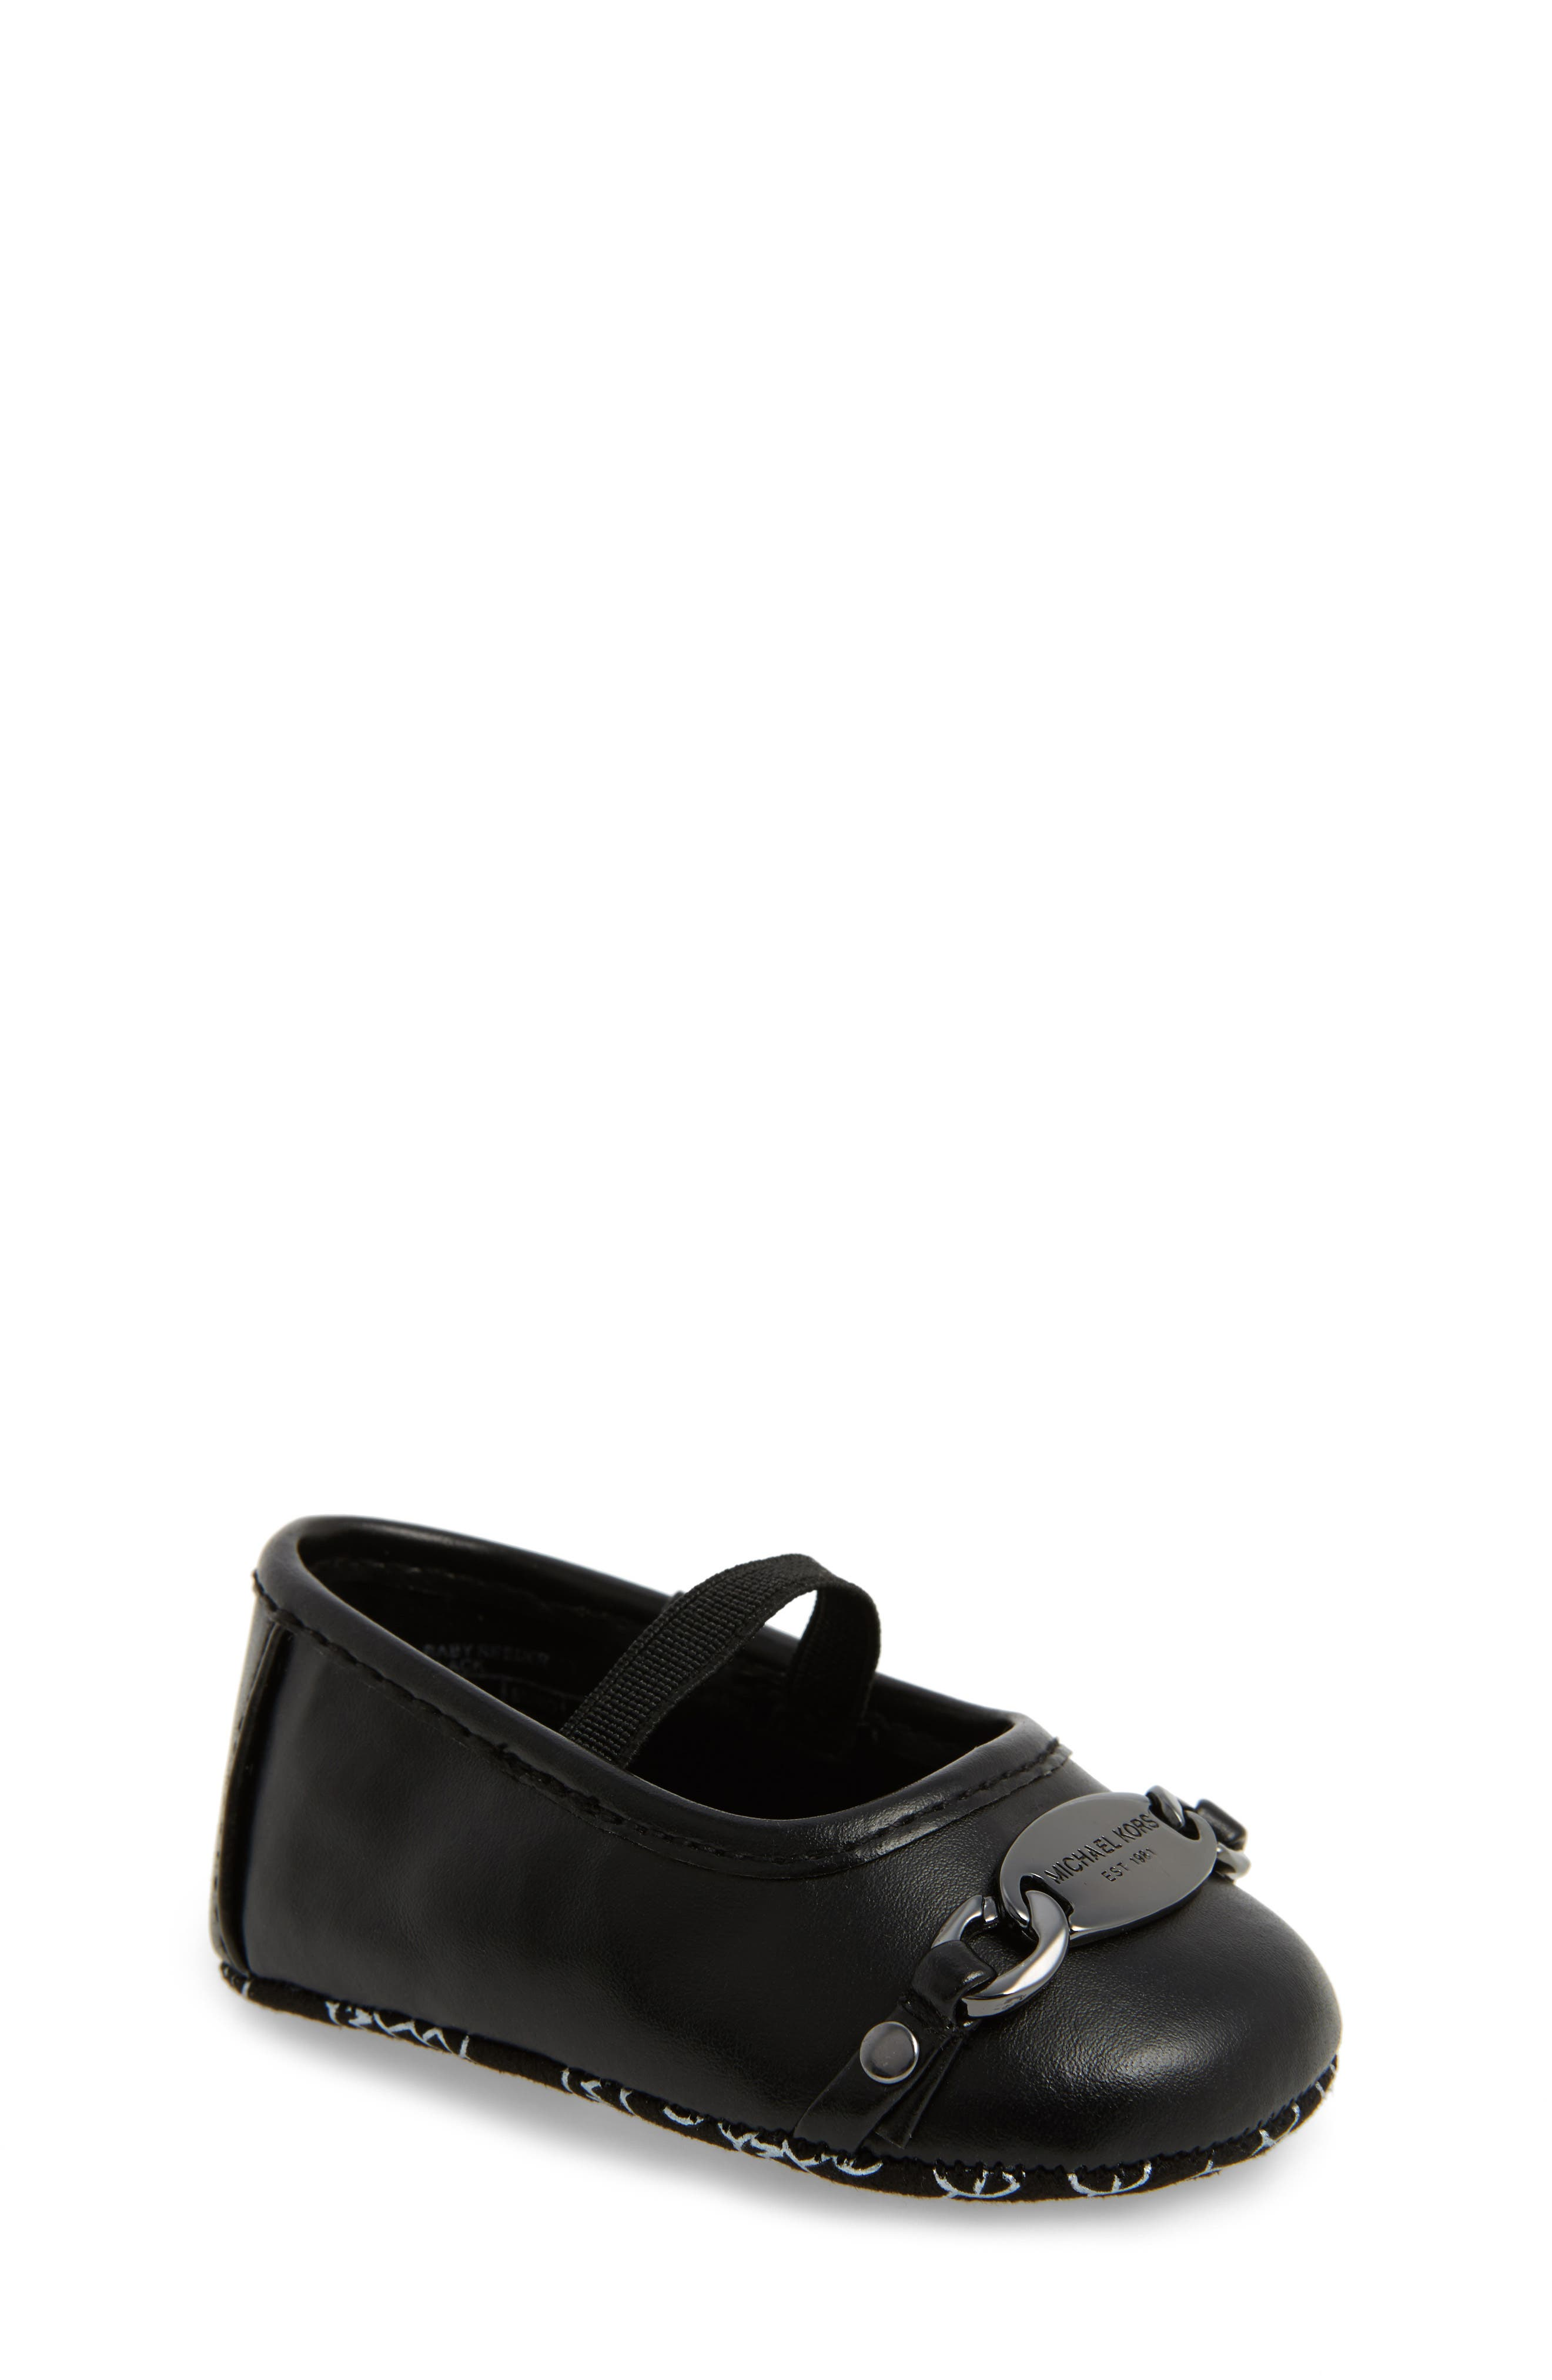 MICHAEL Michael Kors Baby Reeder Crib Shoe (Baby)